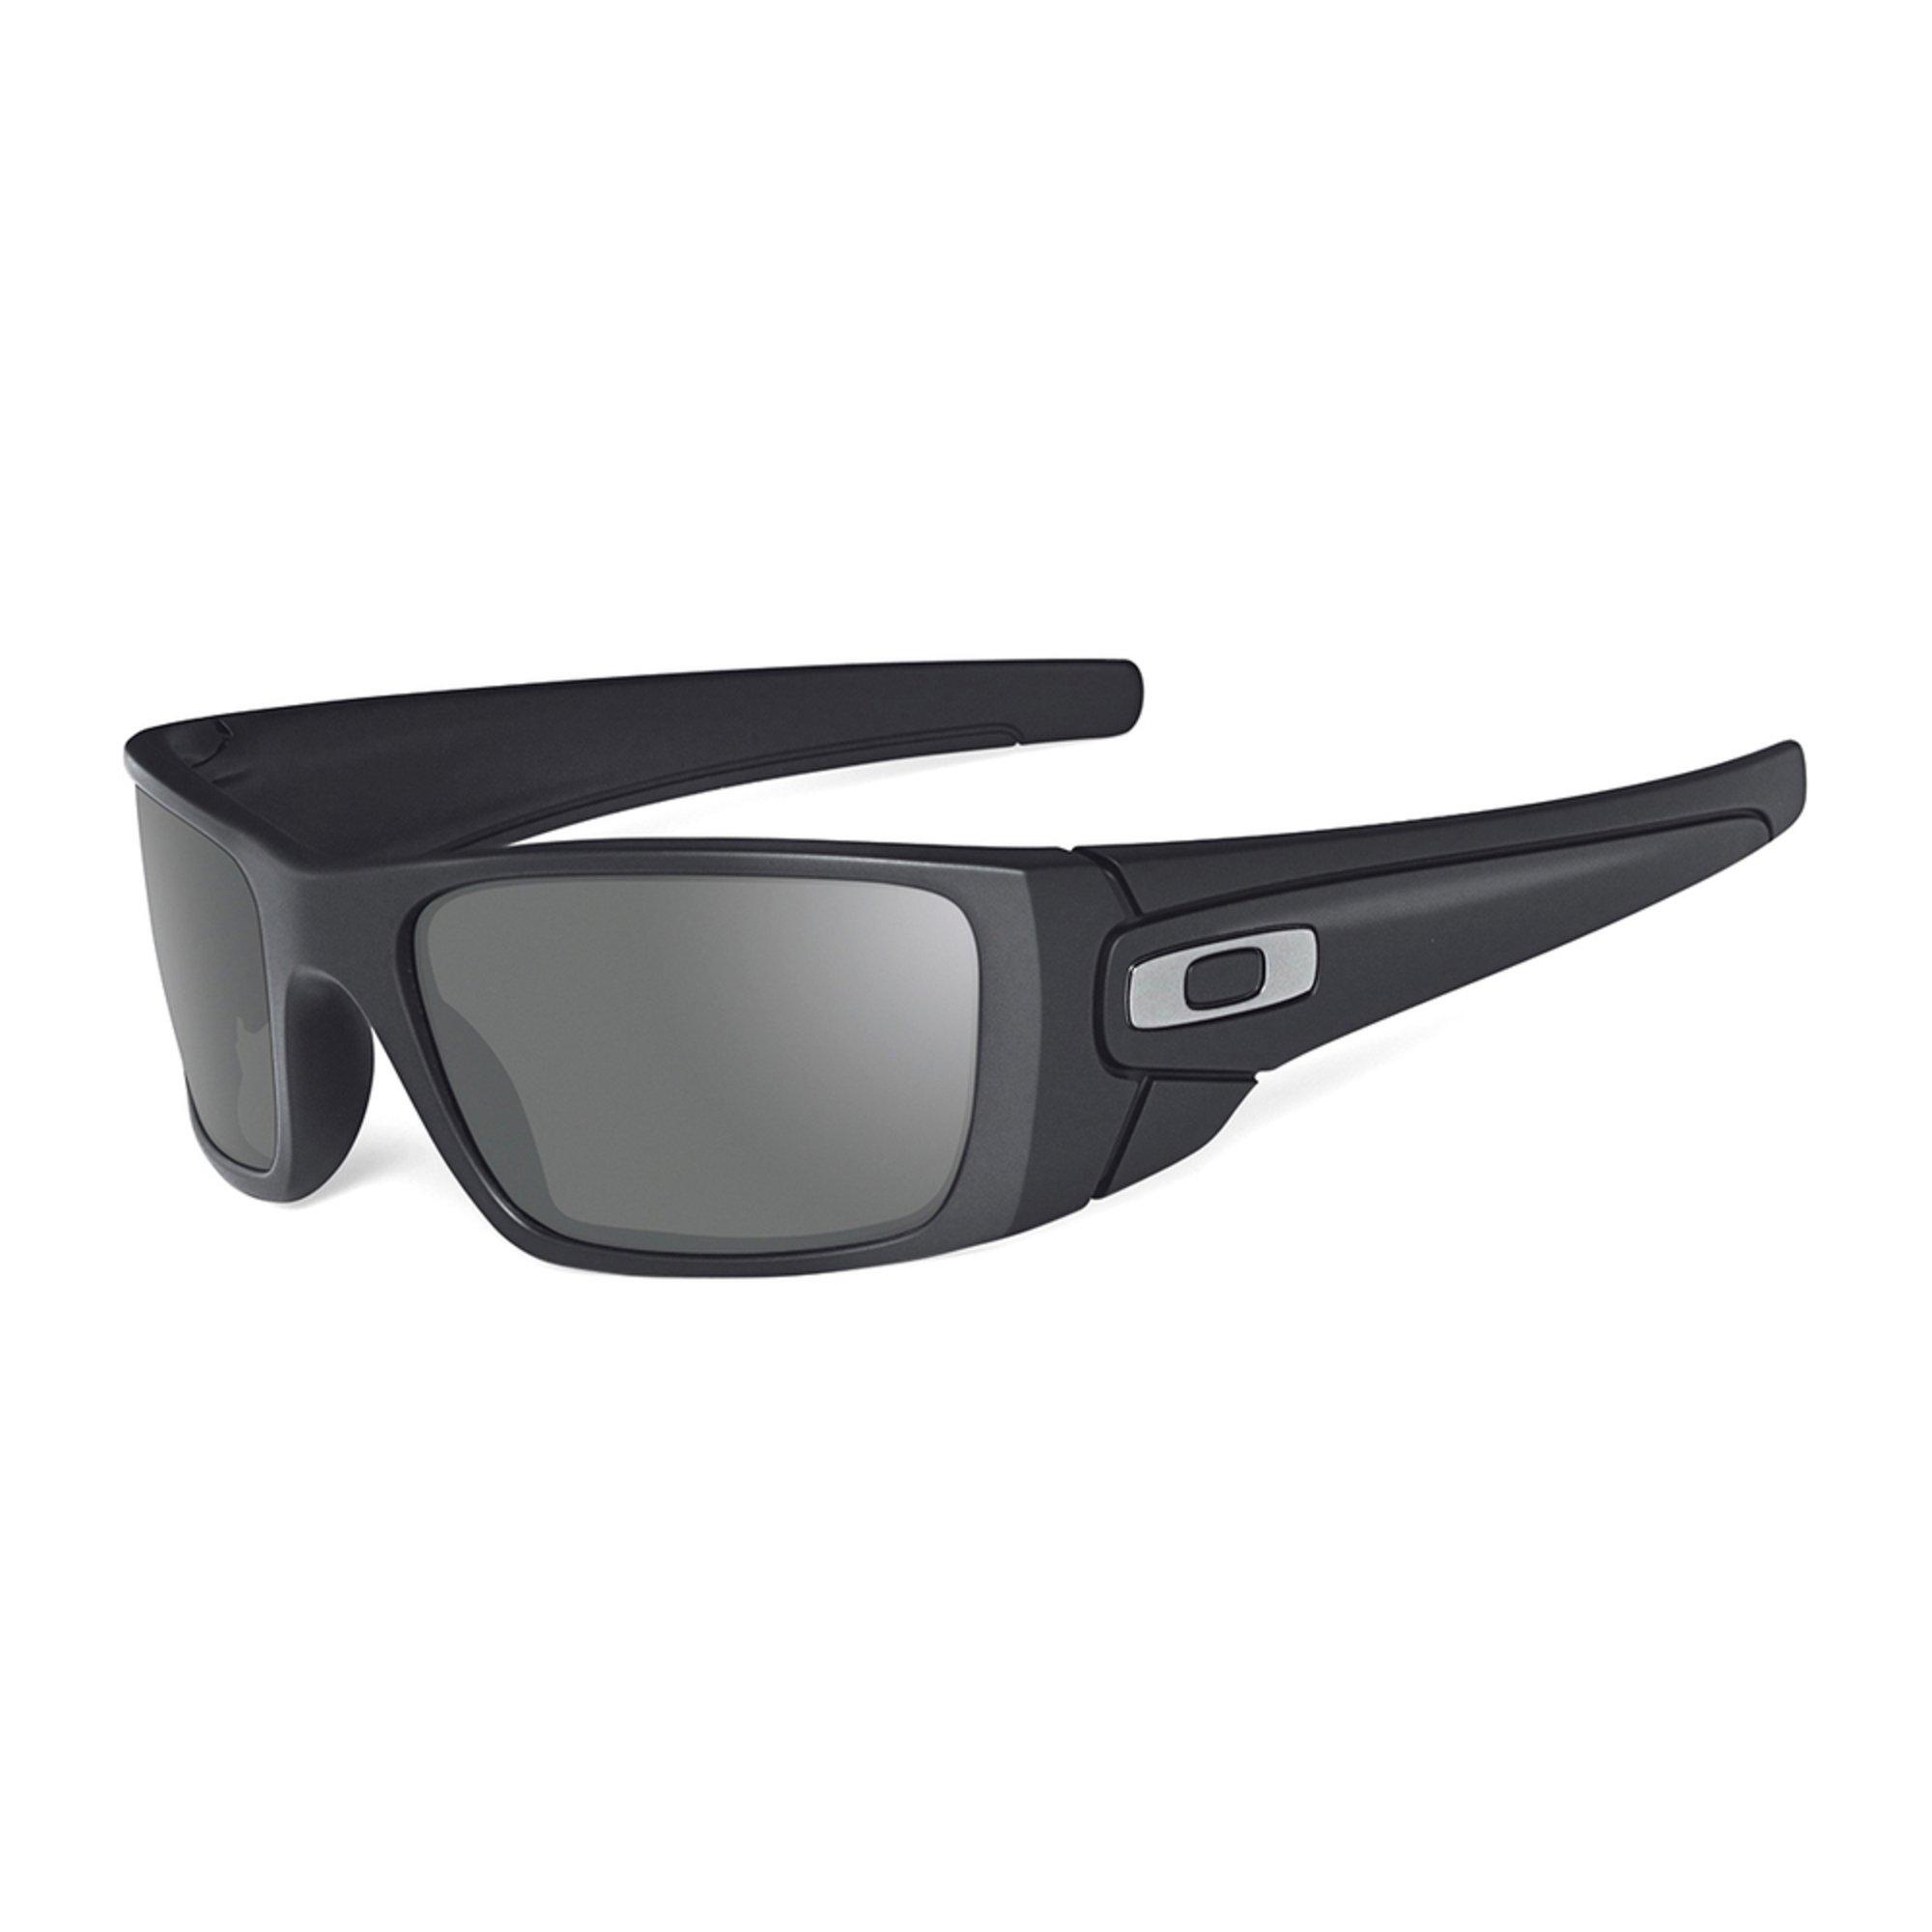 5ffbfe7597 Oakley Military Sunglasses Canada